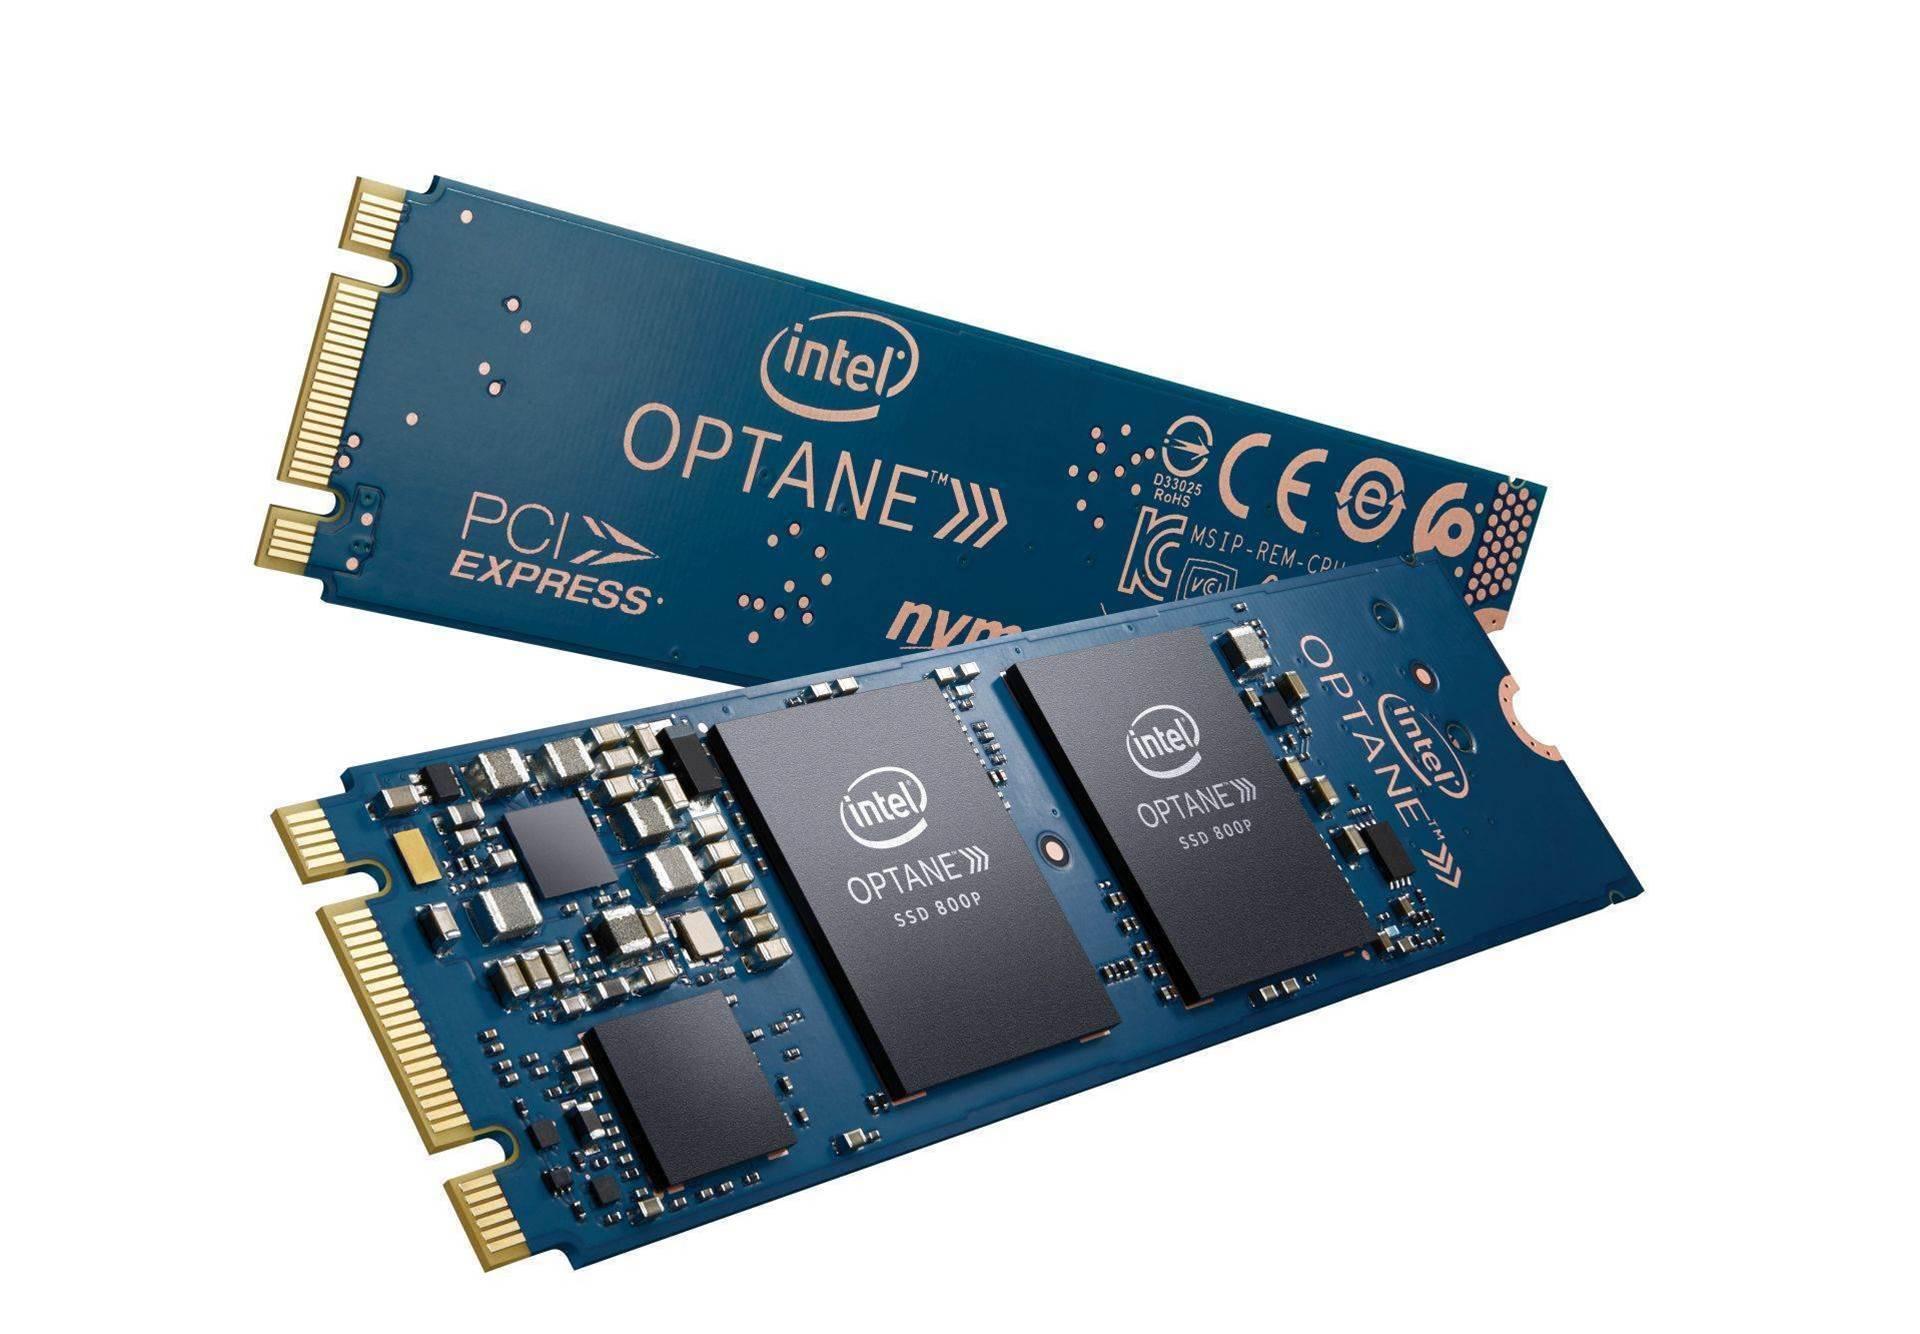 Review: Intel Optane 800P